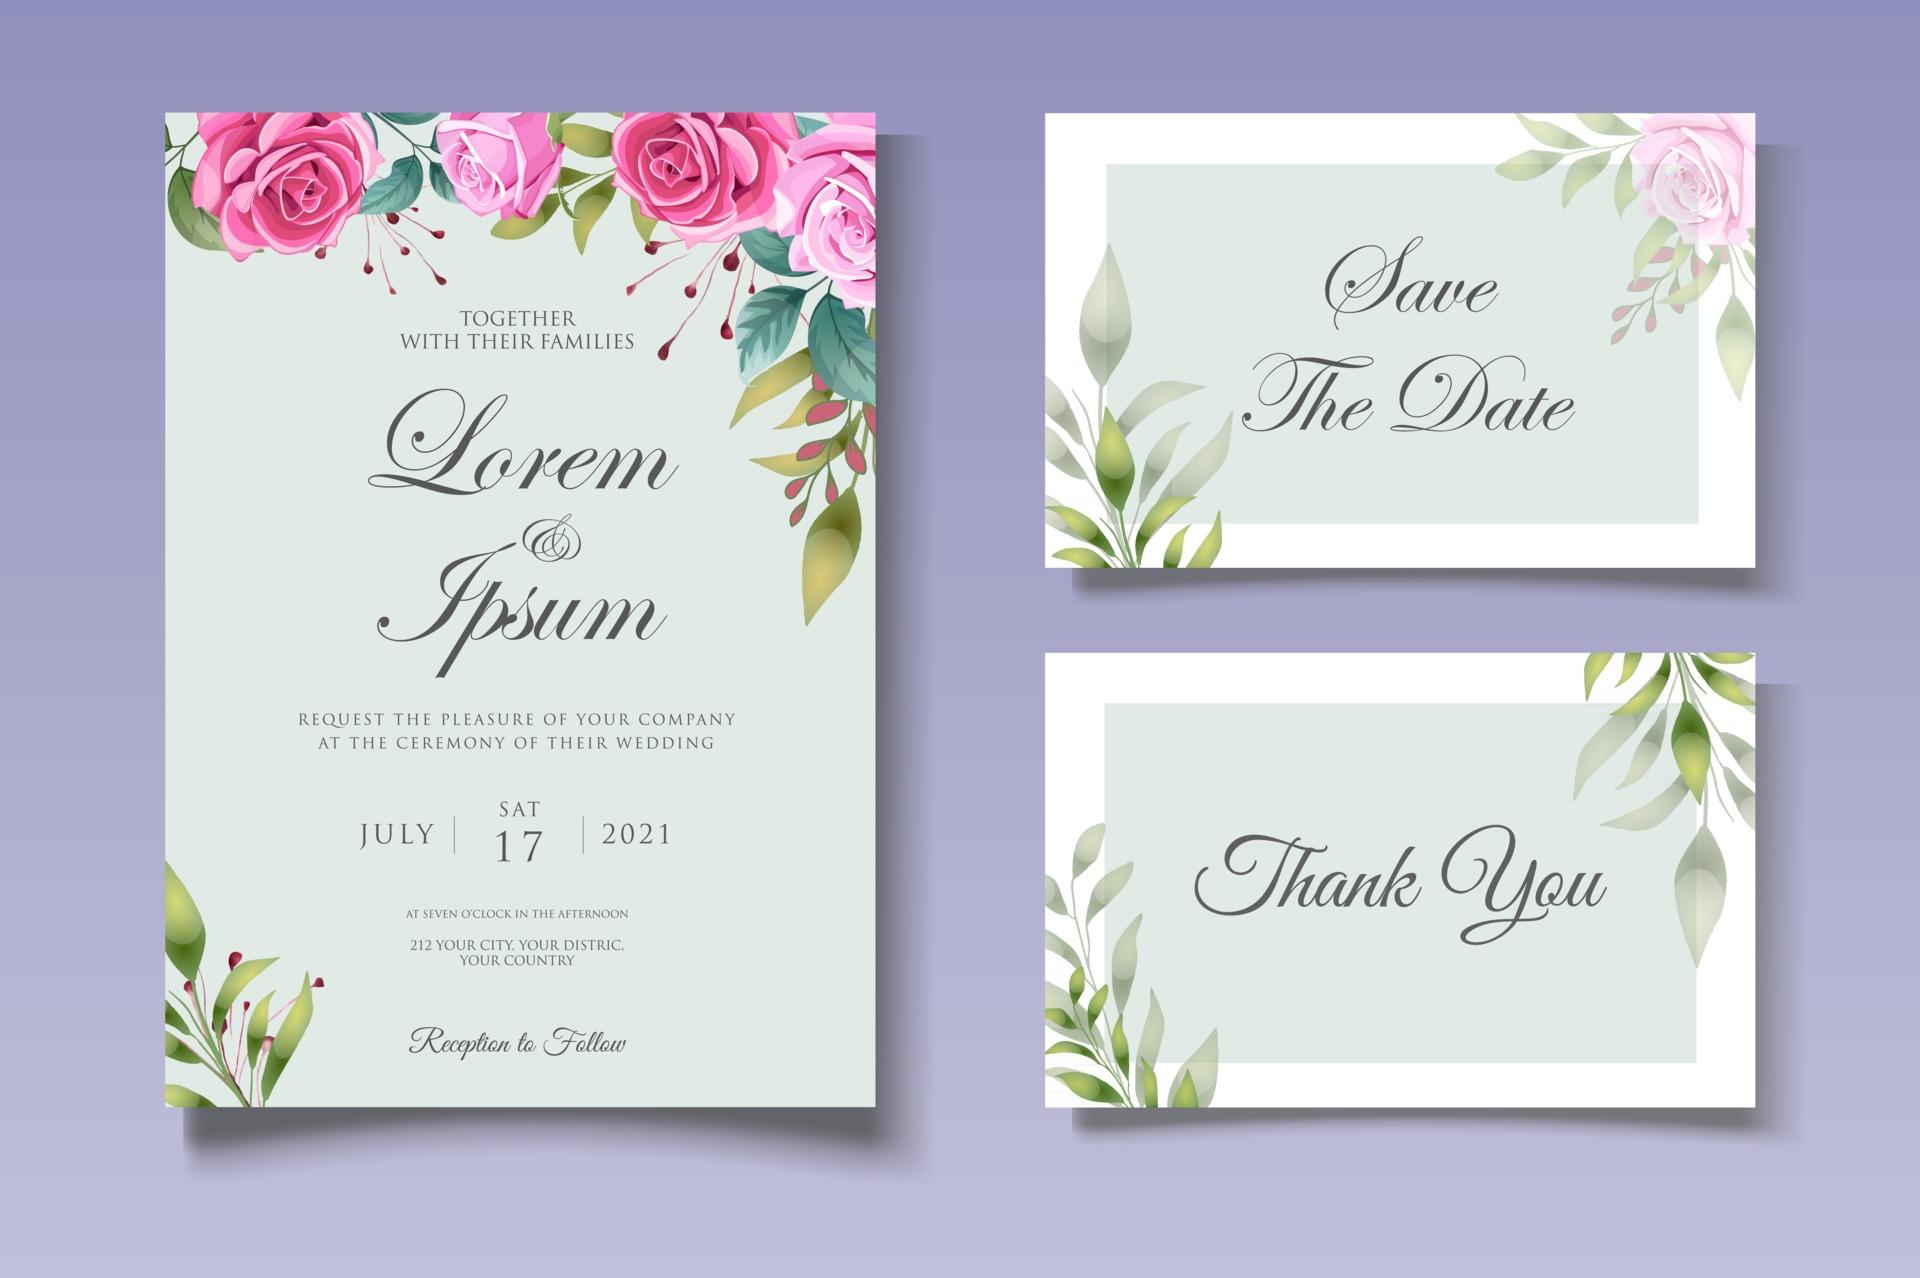 Botanical Wedding Invitation Card Template 2948840 Vector Art At Vecteezy